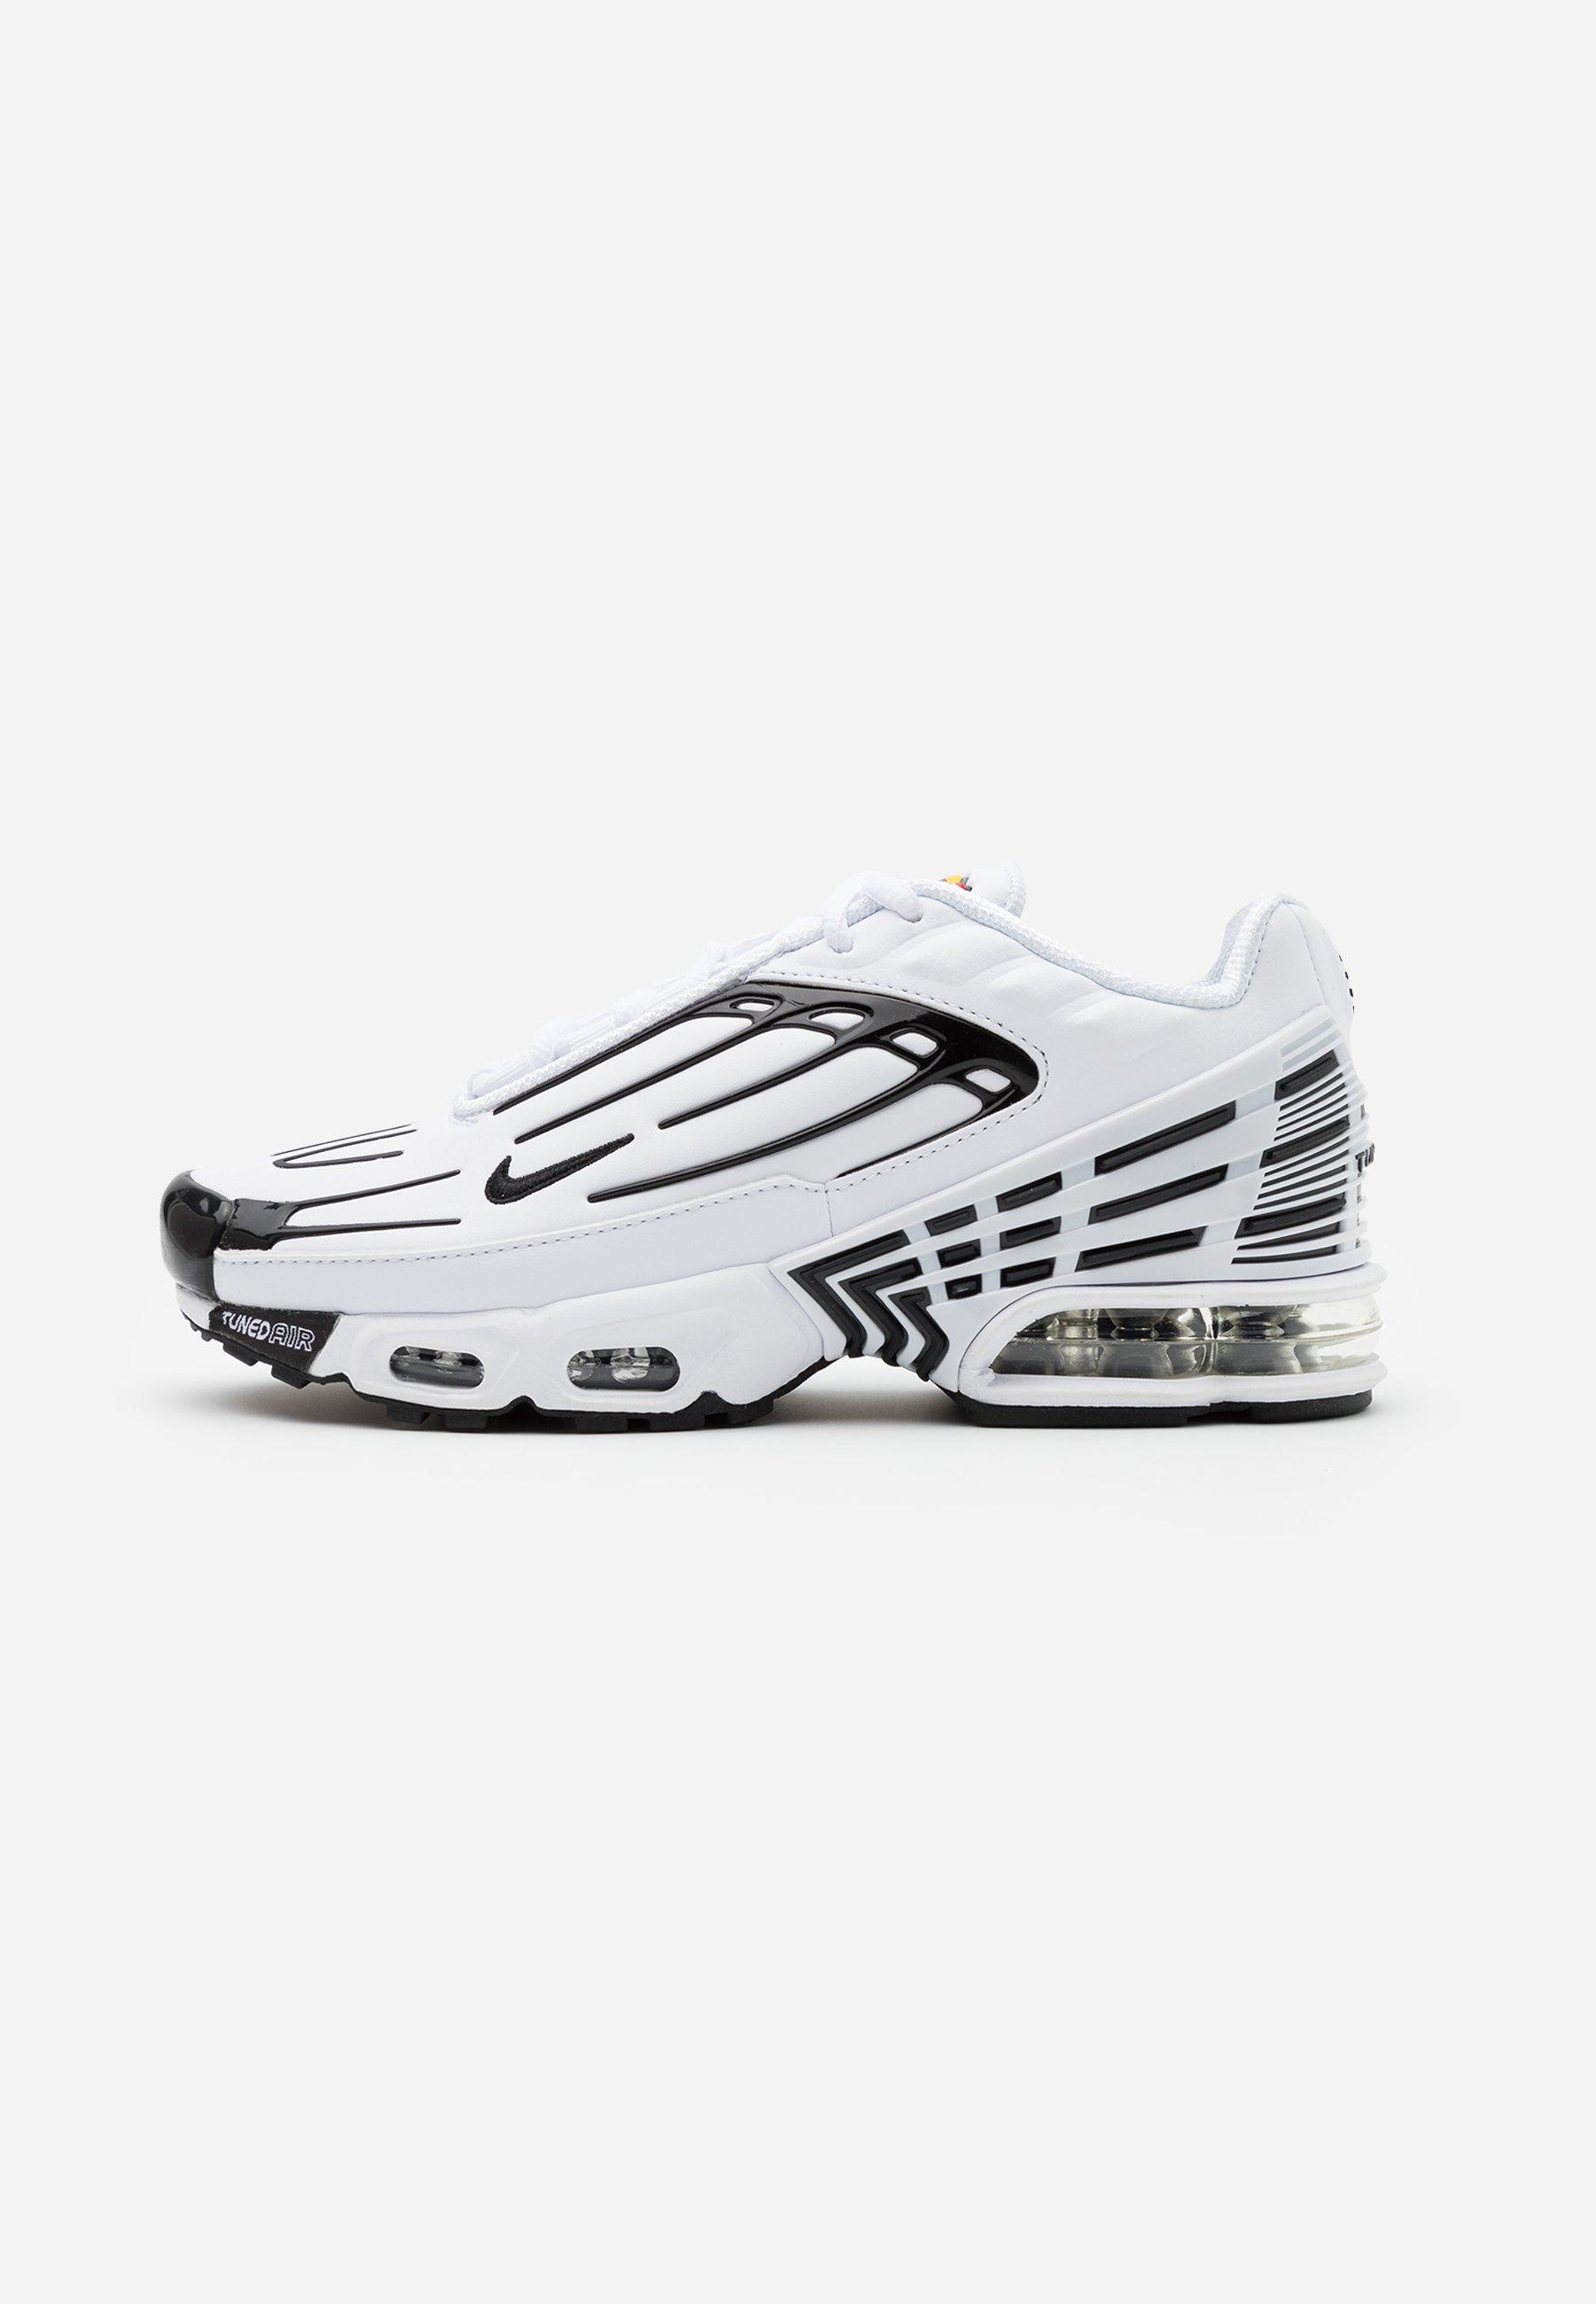 AIR MAX PLUS III Sneakers whiteblackchile red